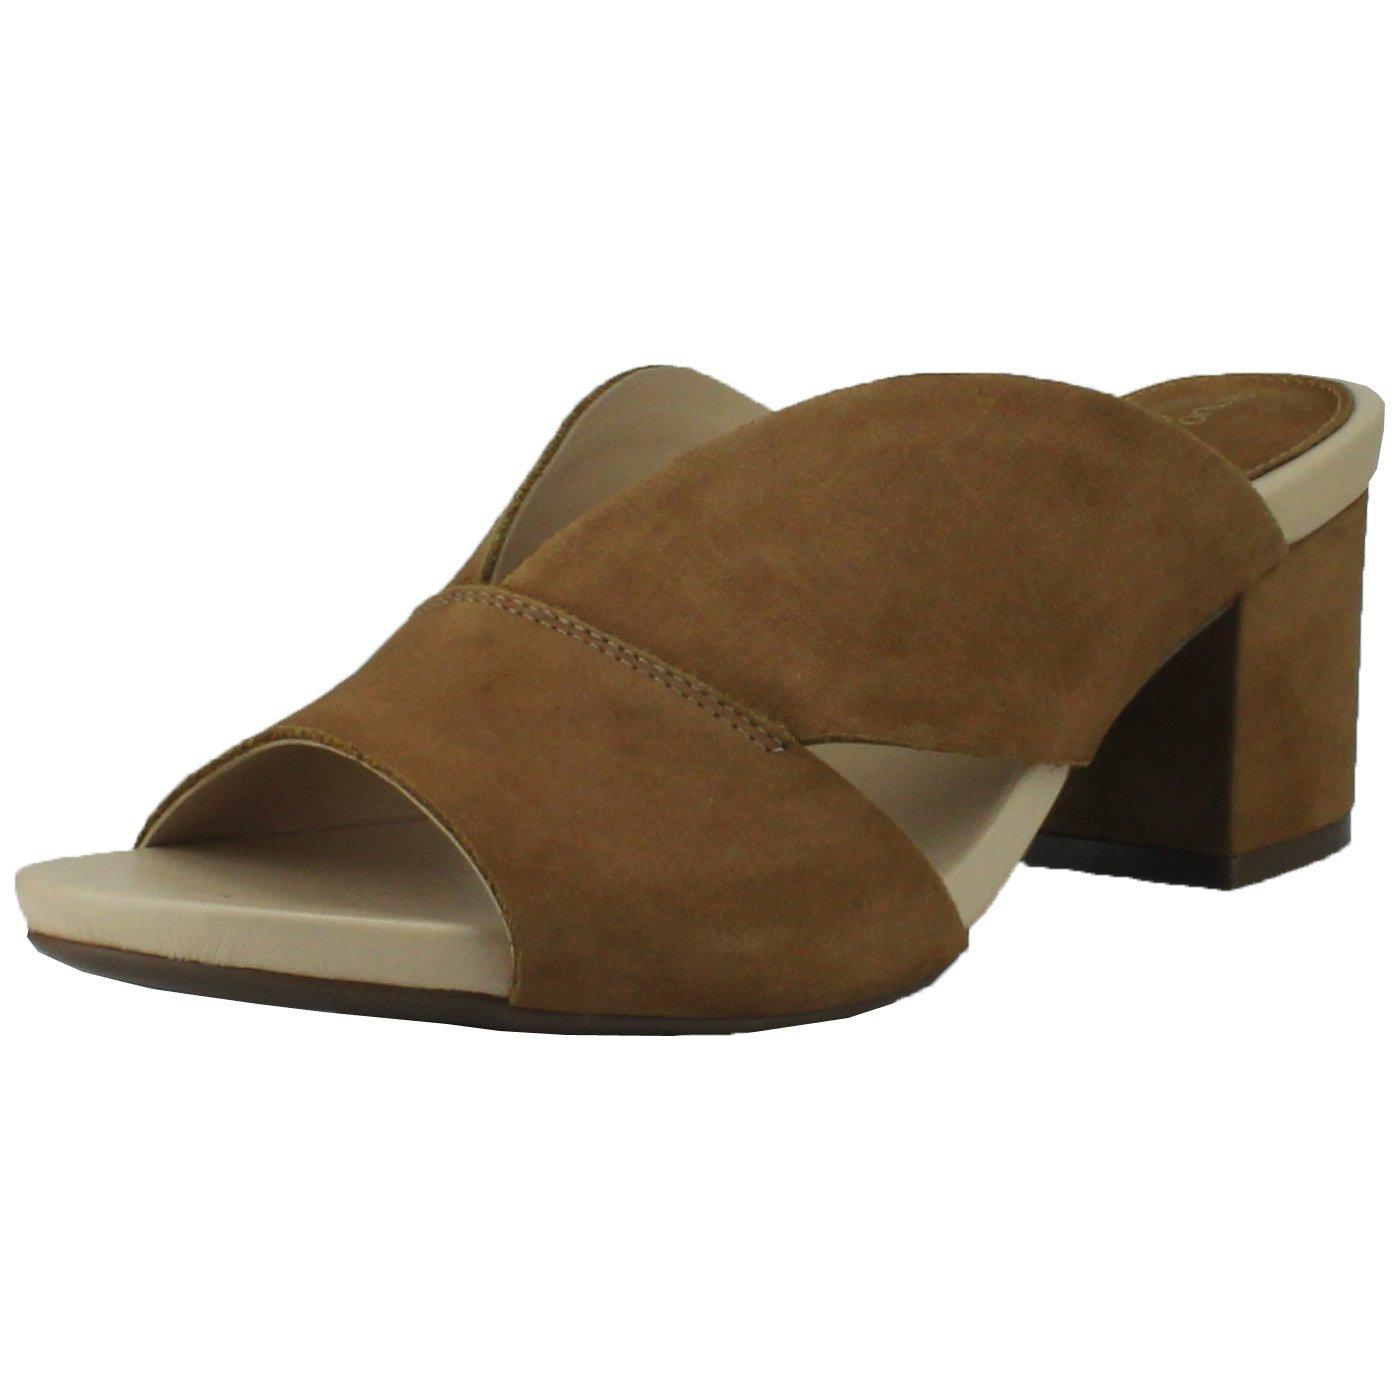 Bruno Menegatti Leather Slide Sandal, 9 US by Bruno Menegatti